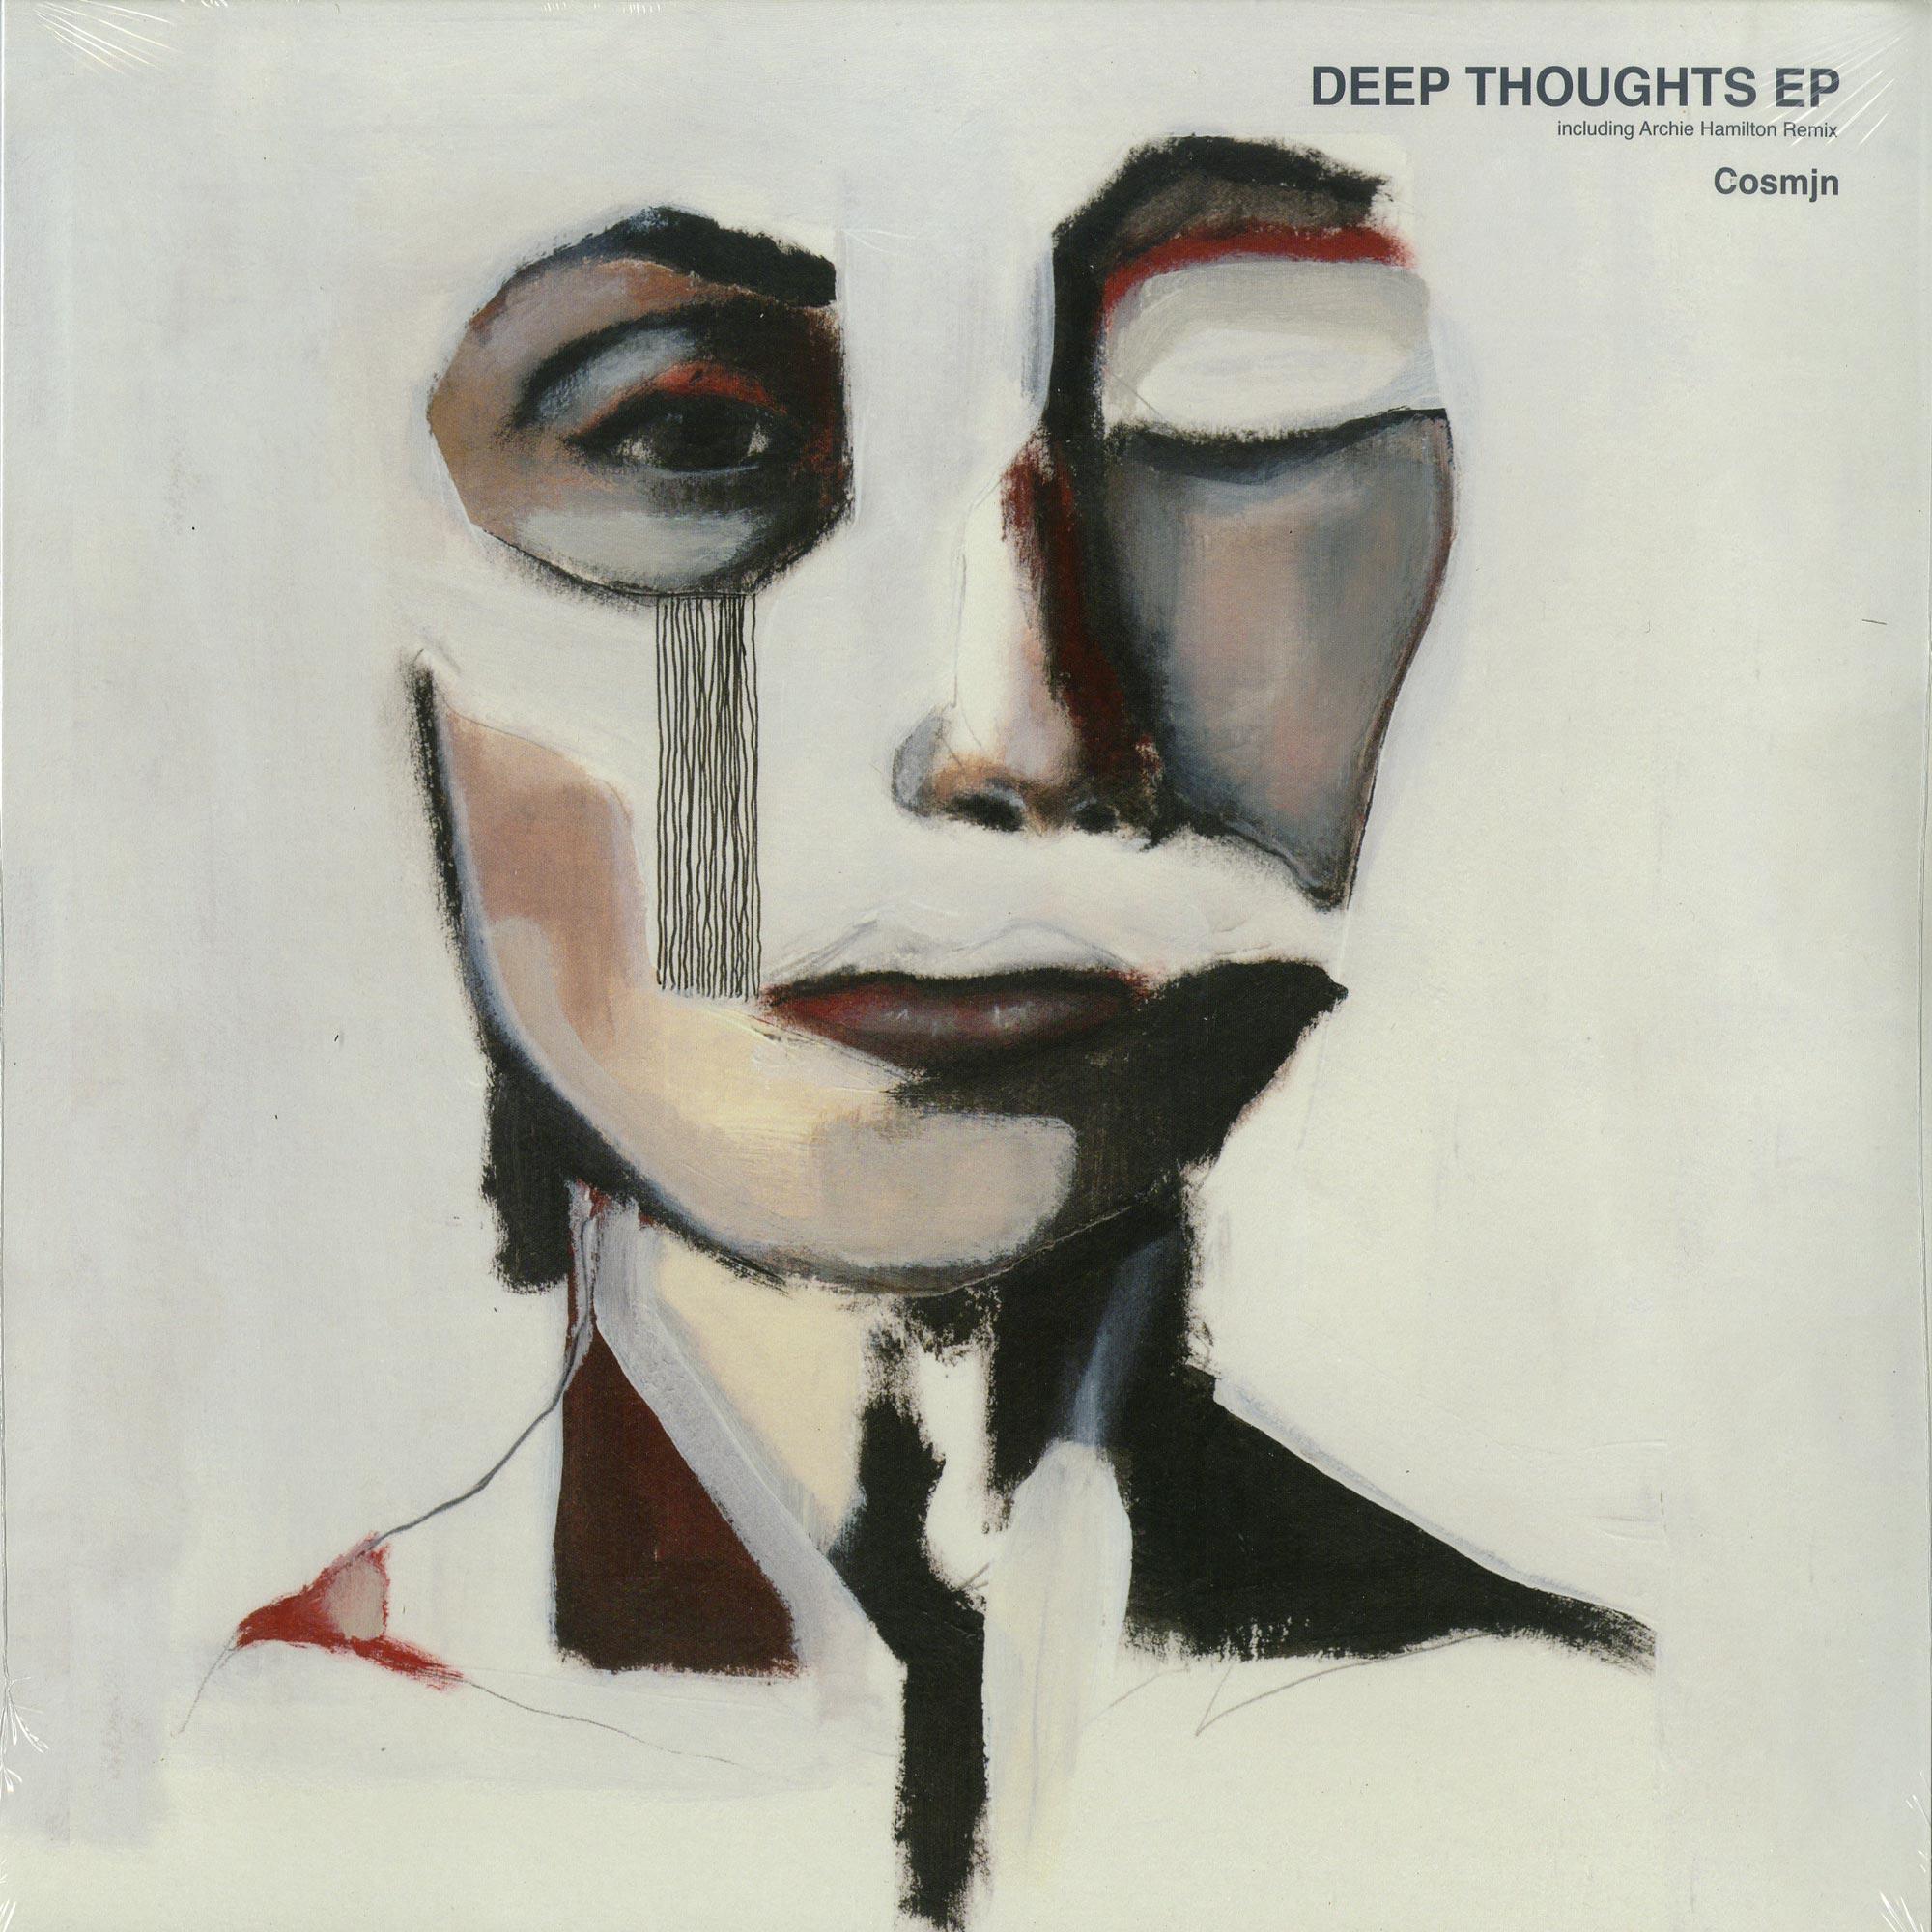 Cosmjn - DEEP THOUGHTS EP